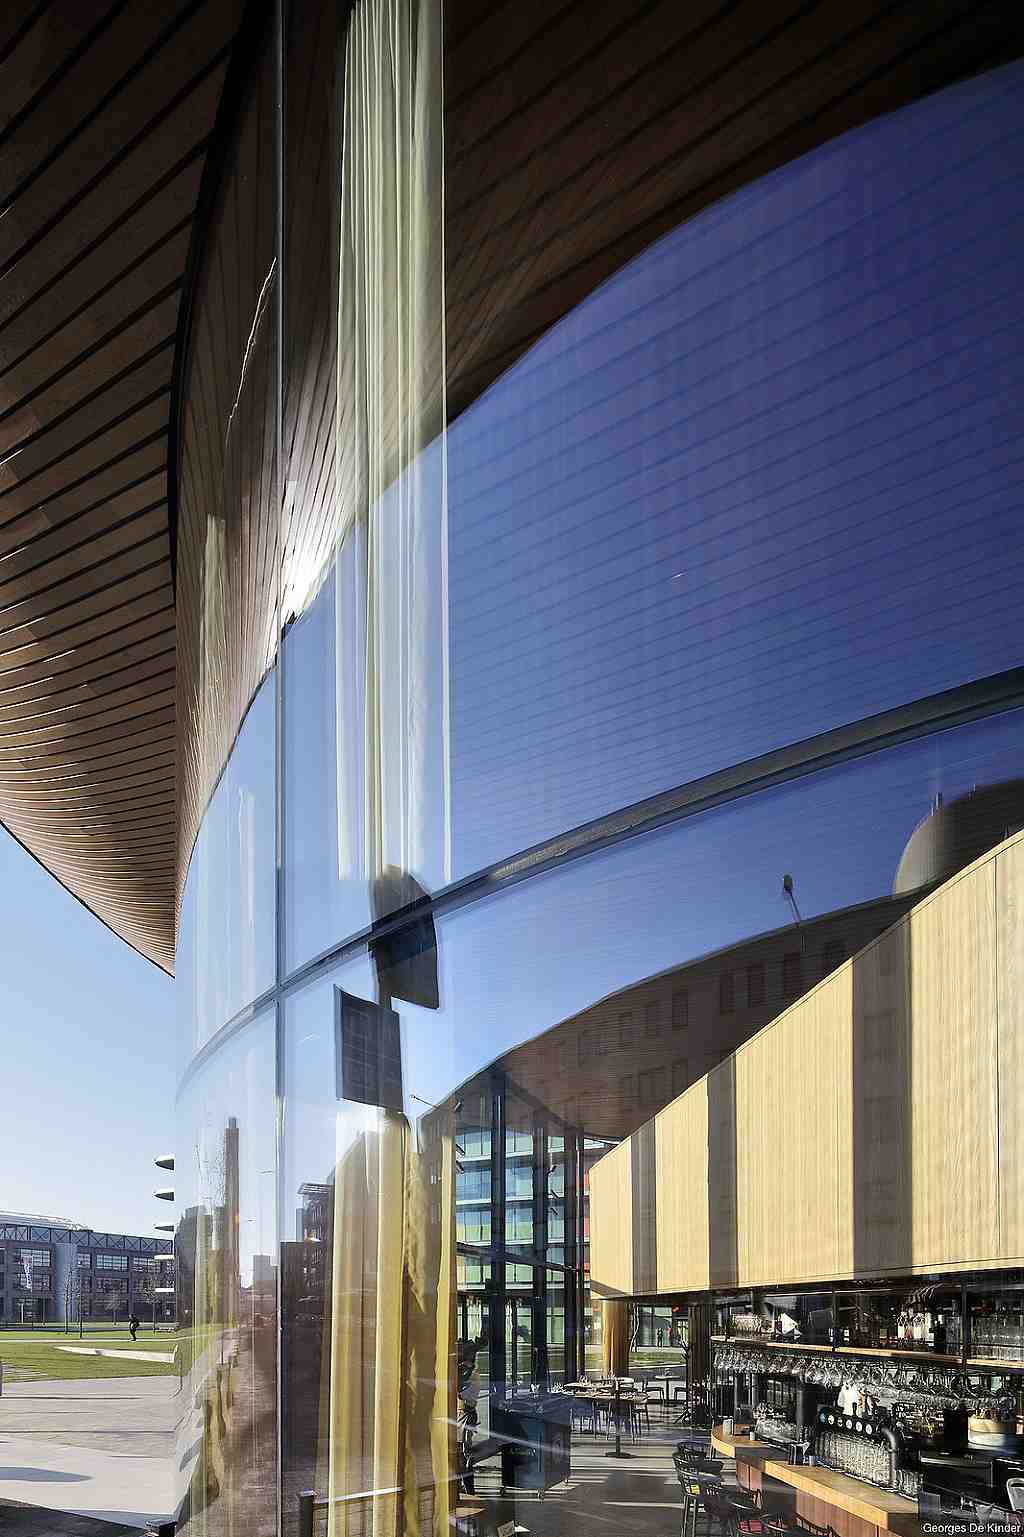 Budova ING Amsterdam, Nizozemsko, ohýbaná skla - foto č.5 detail